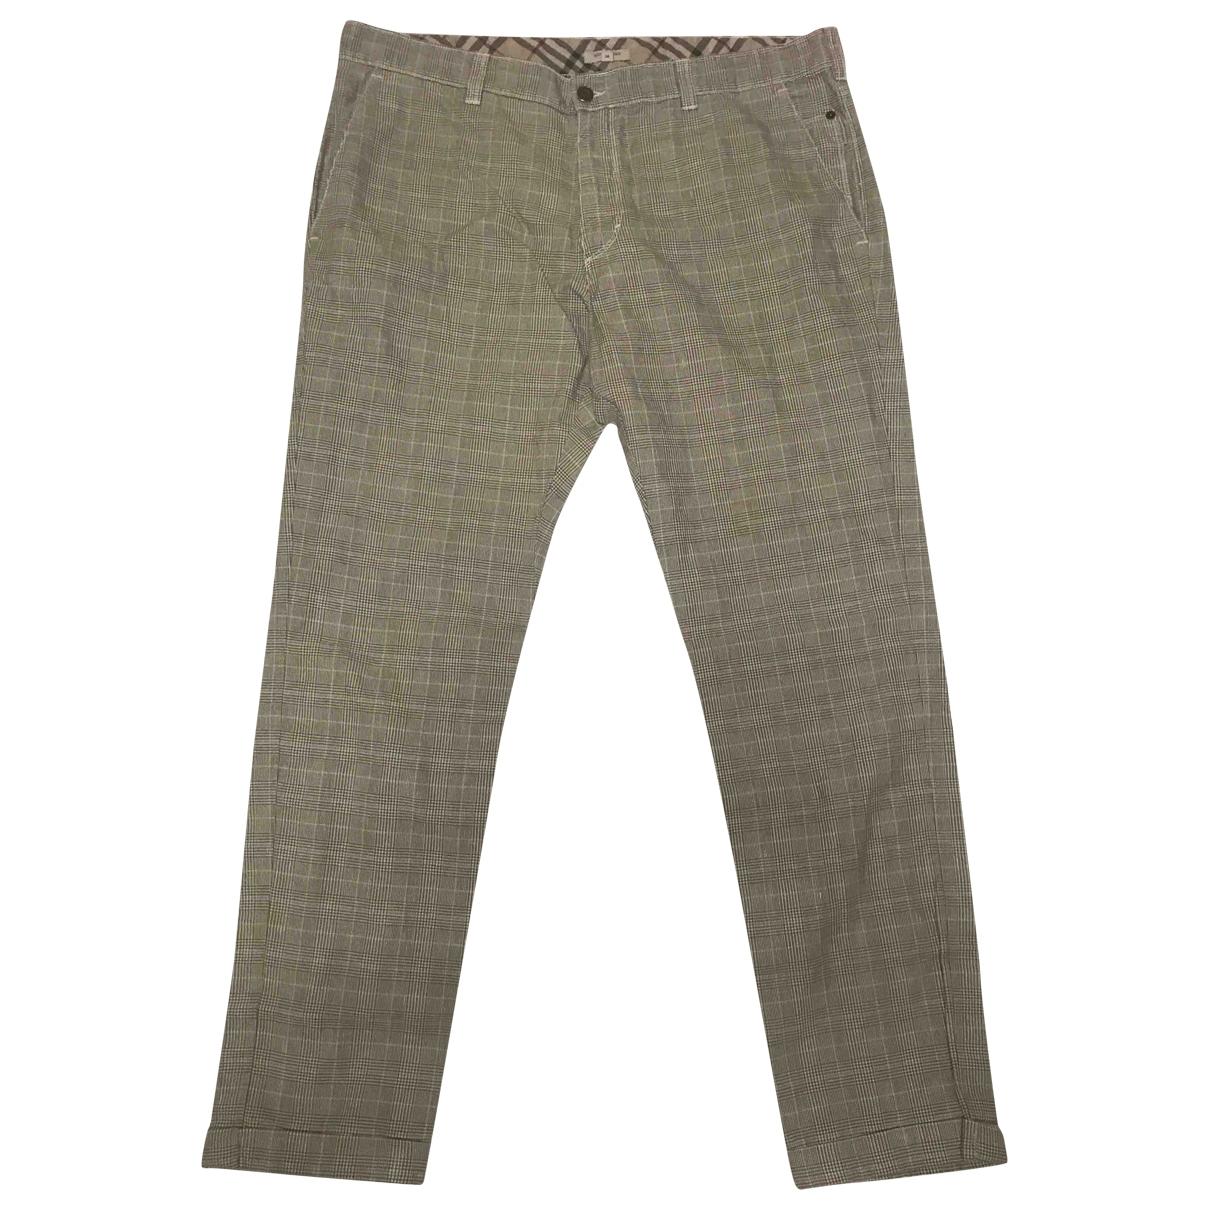 Burberry \N Beige Cotton Trousers for Men 56 IT